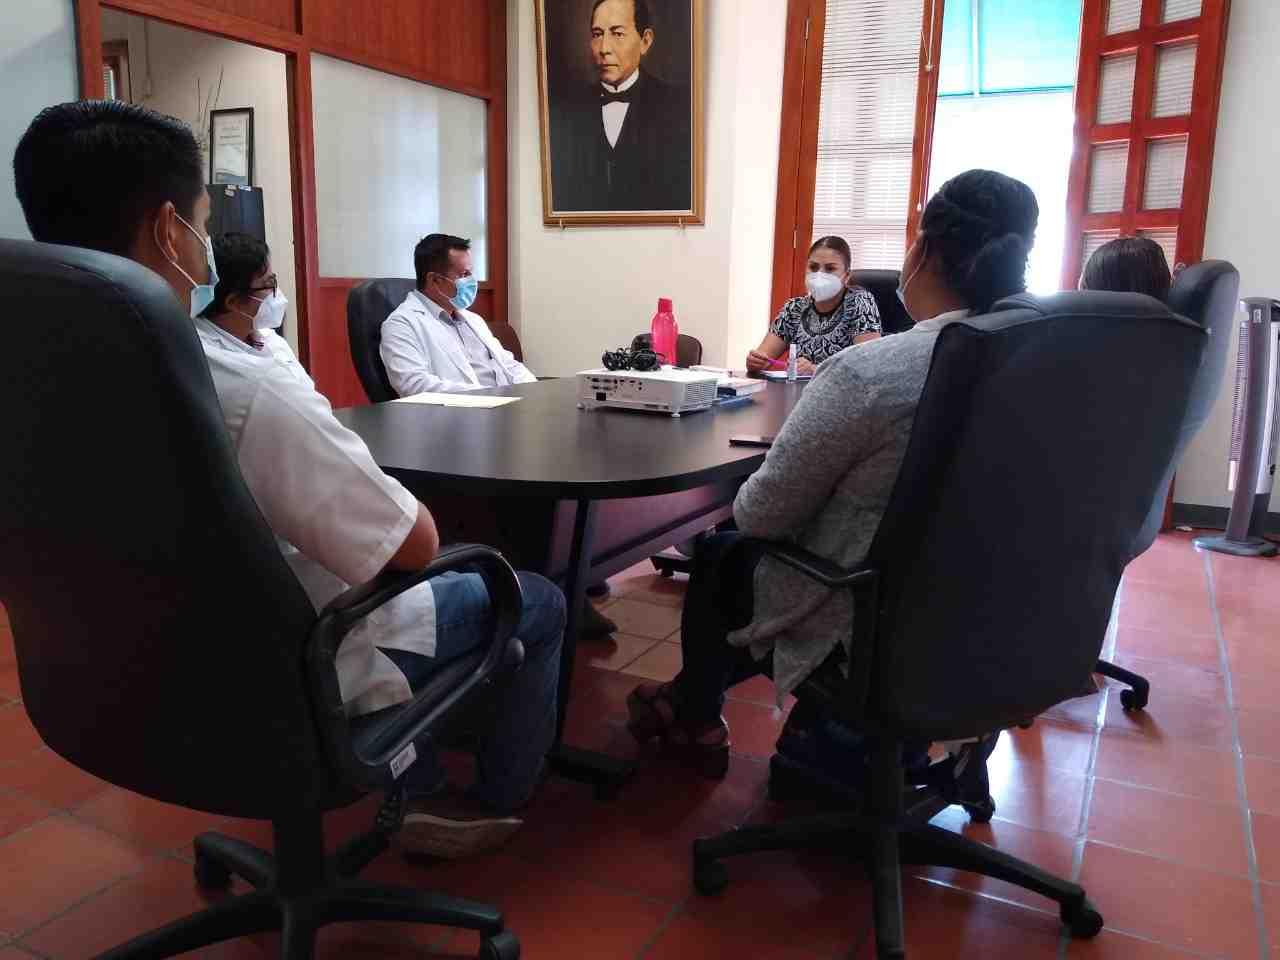 HABRÁ CAMPAÑA DE DESCACHARRIZACIÓN EN HUATUSCO